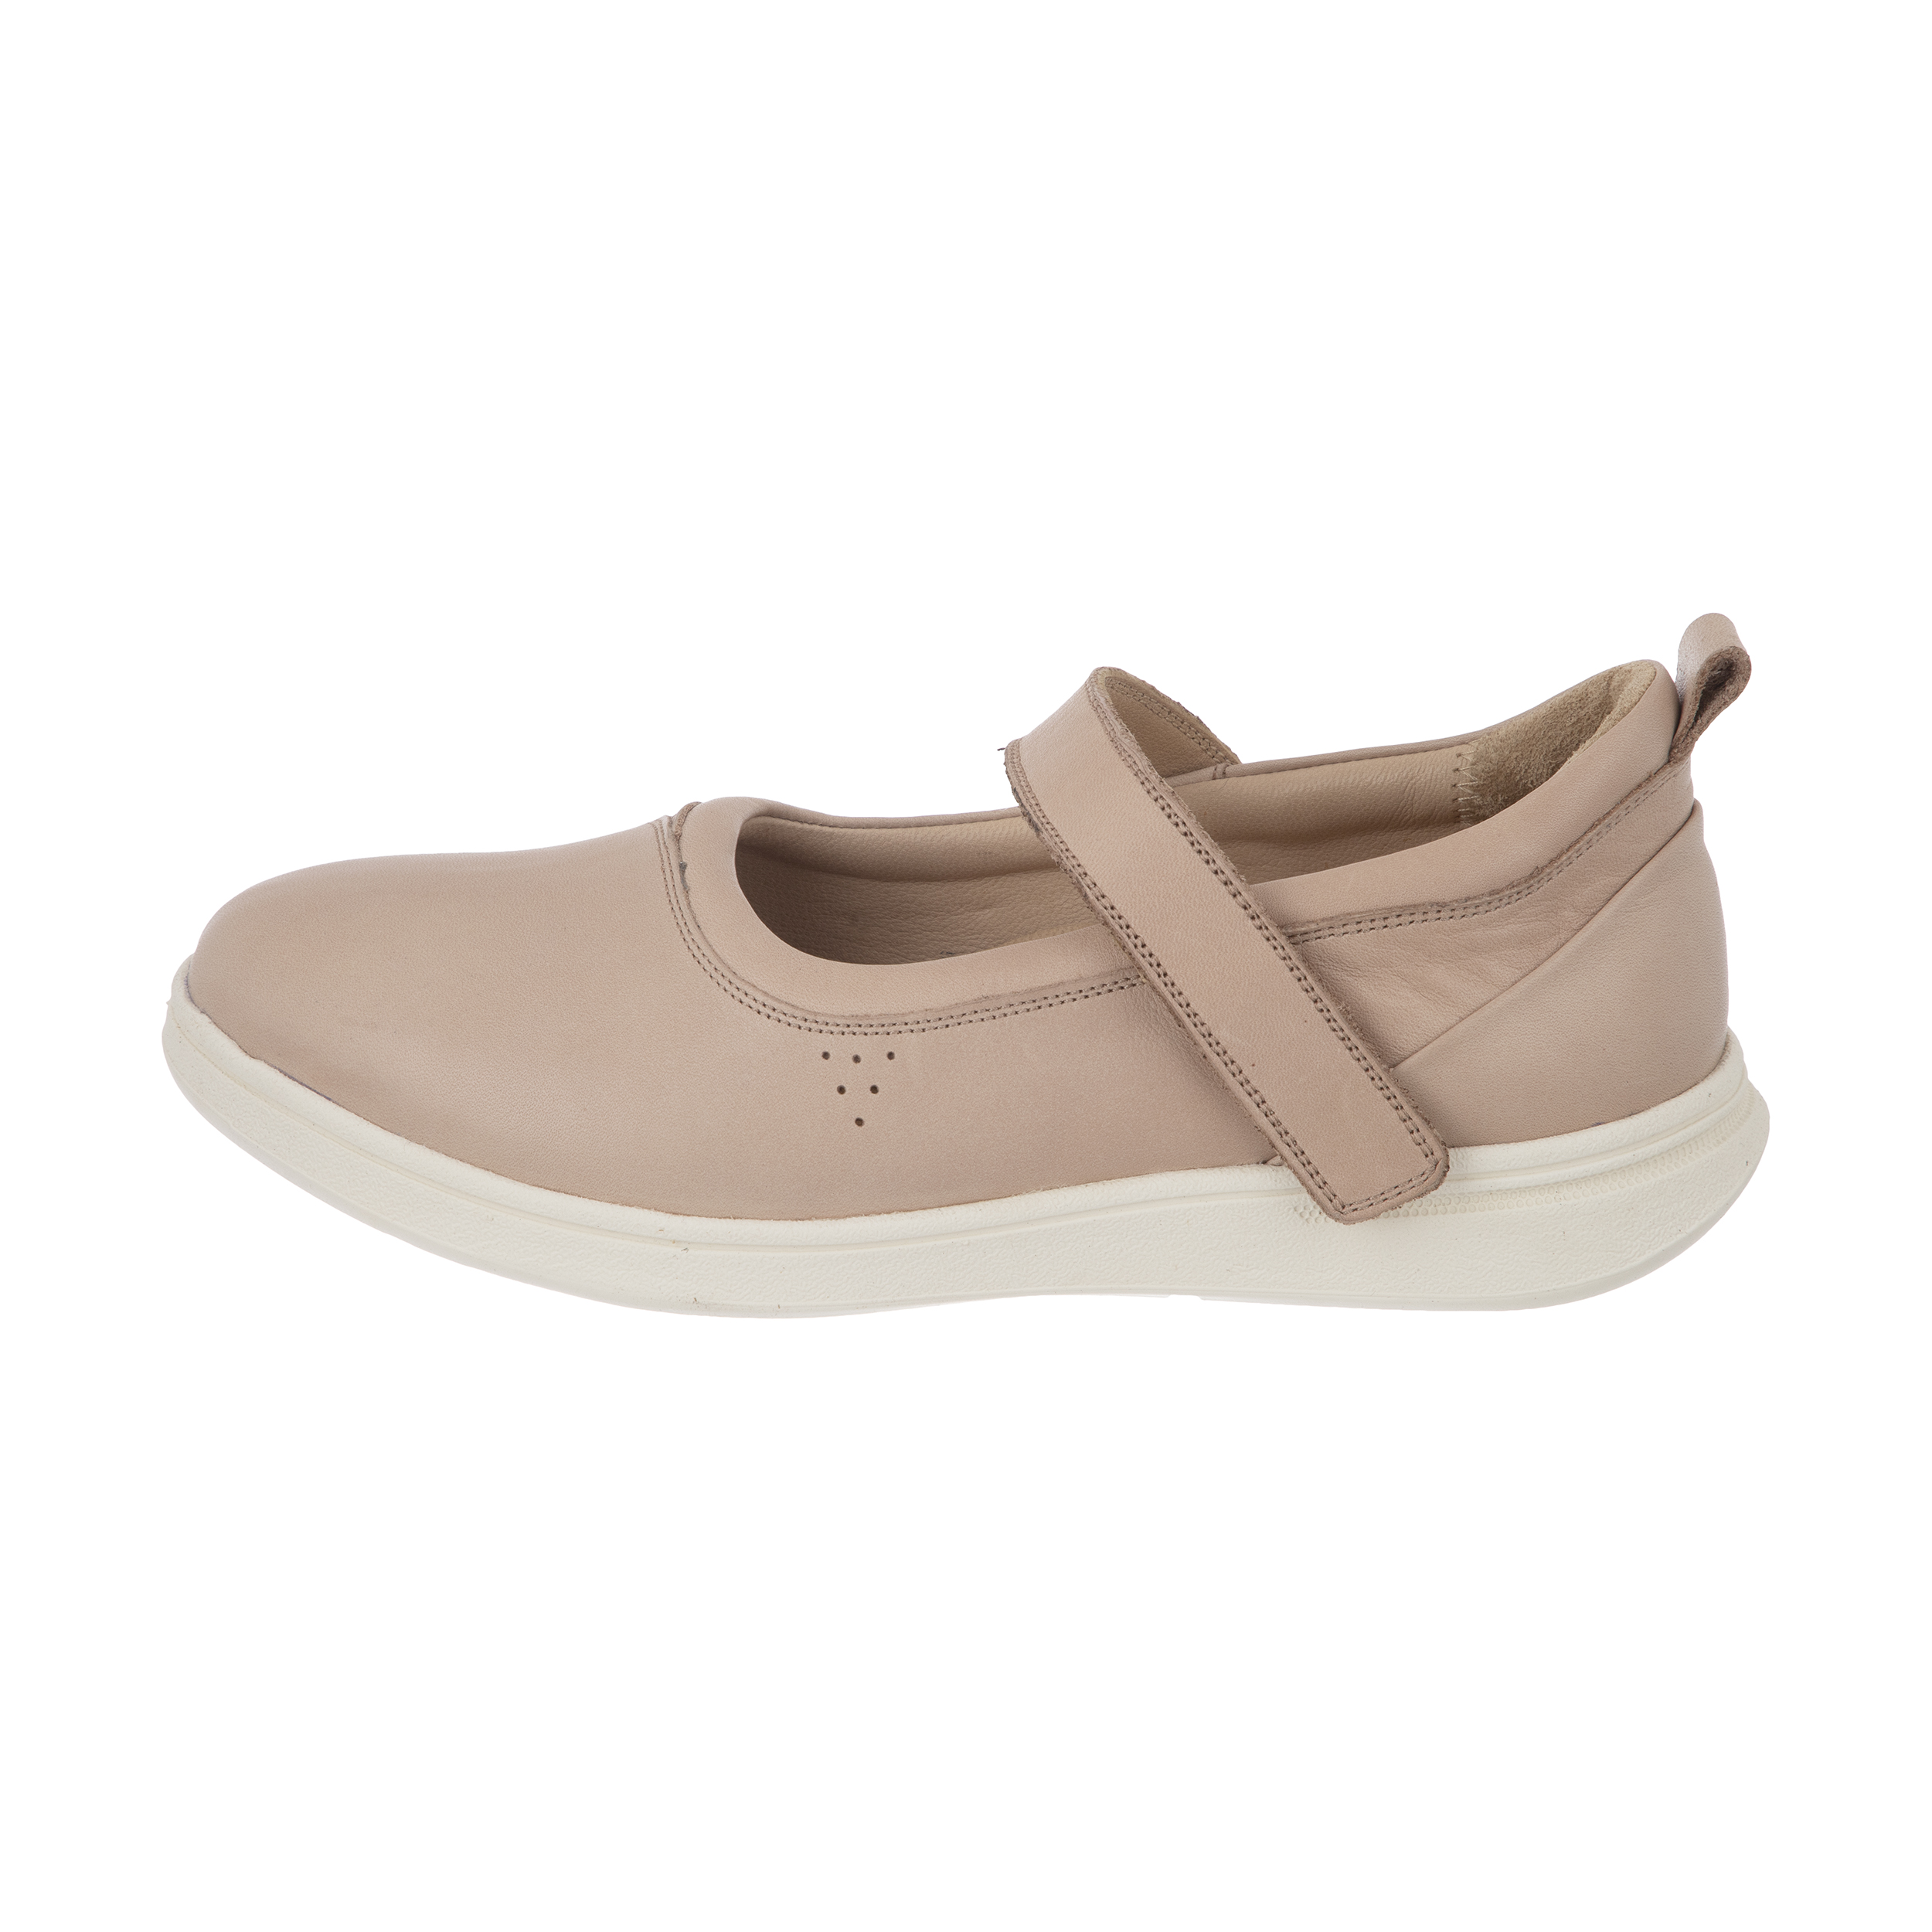 کفش روزمره زنانه برتونیکس مدل 920-047